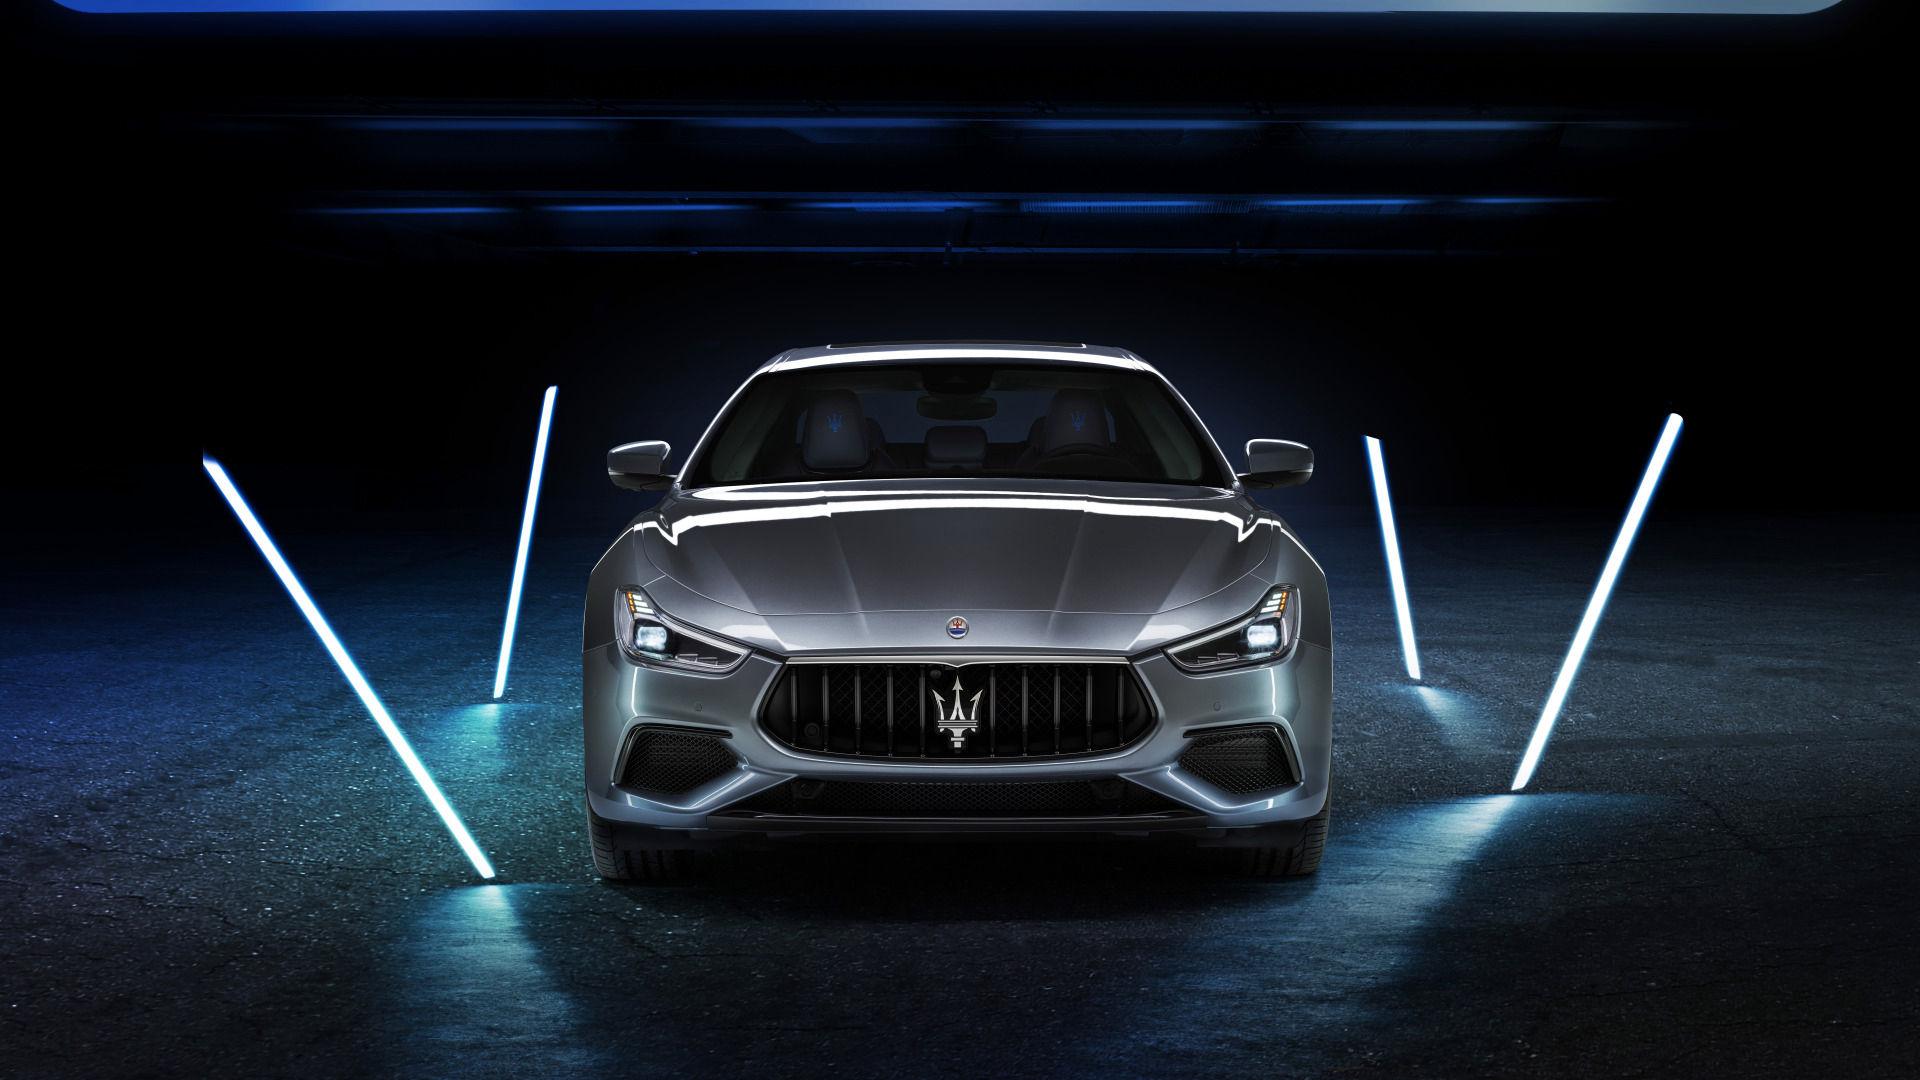 Maserati Ghibli Hybrid - Electric Sportscar: Front view